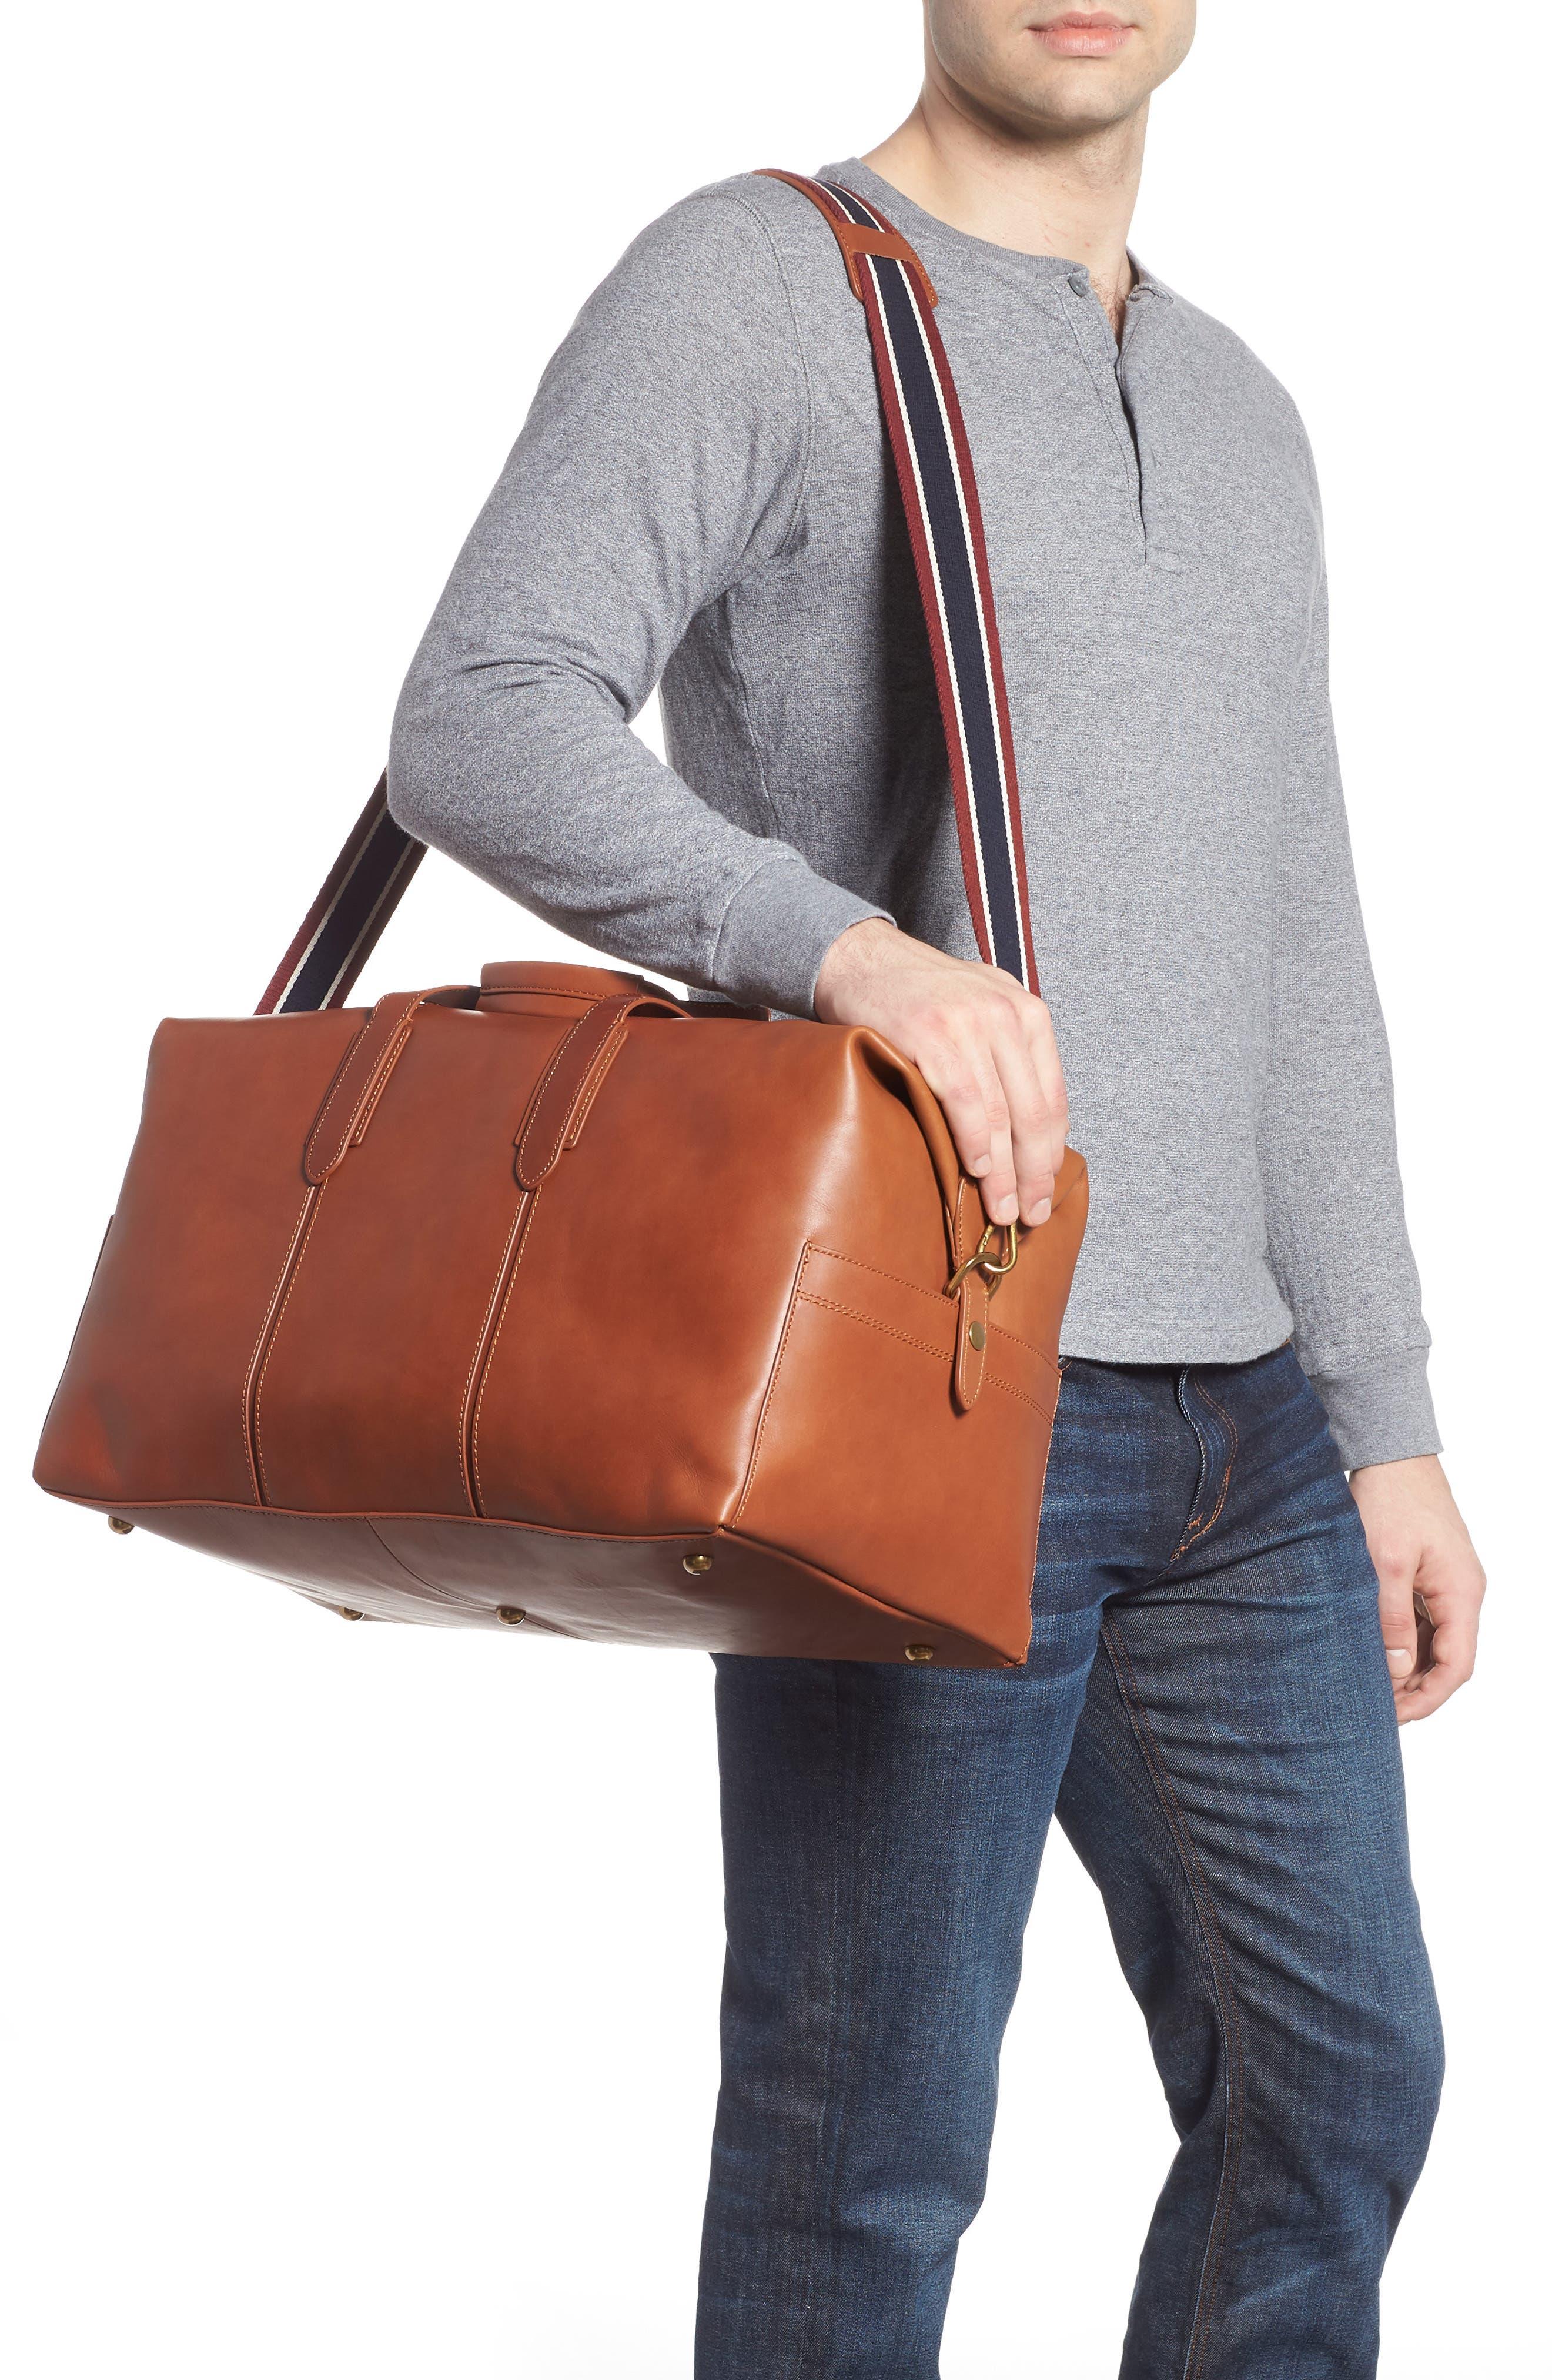 Oar Stripe Weekend Bag,                             Alternate thumbnail 2, color,                             BURNISHED SIENNA